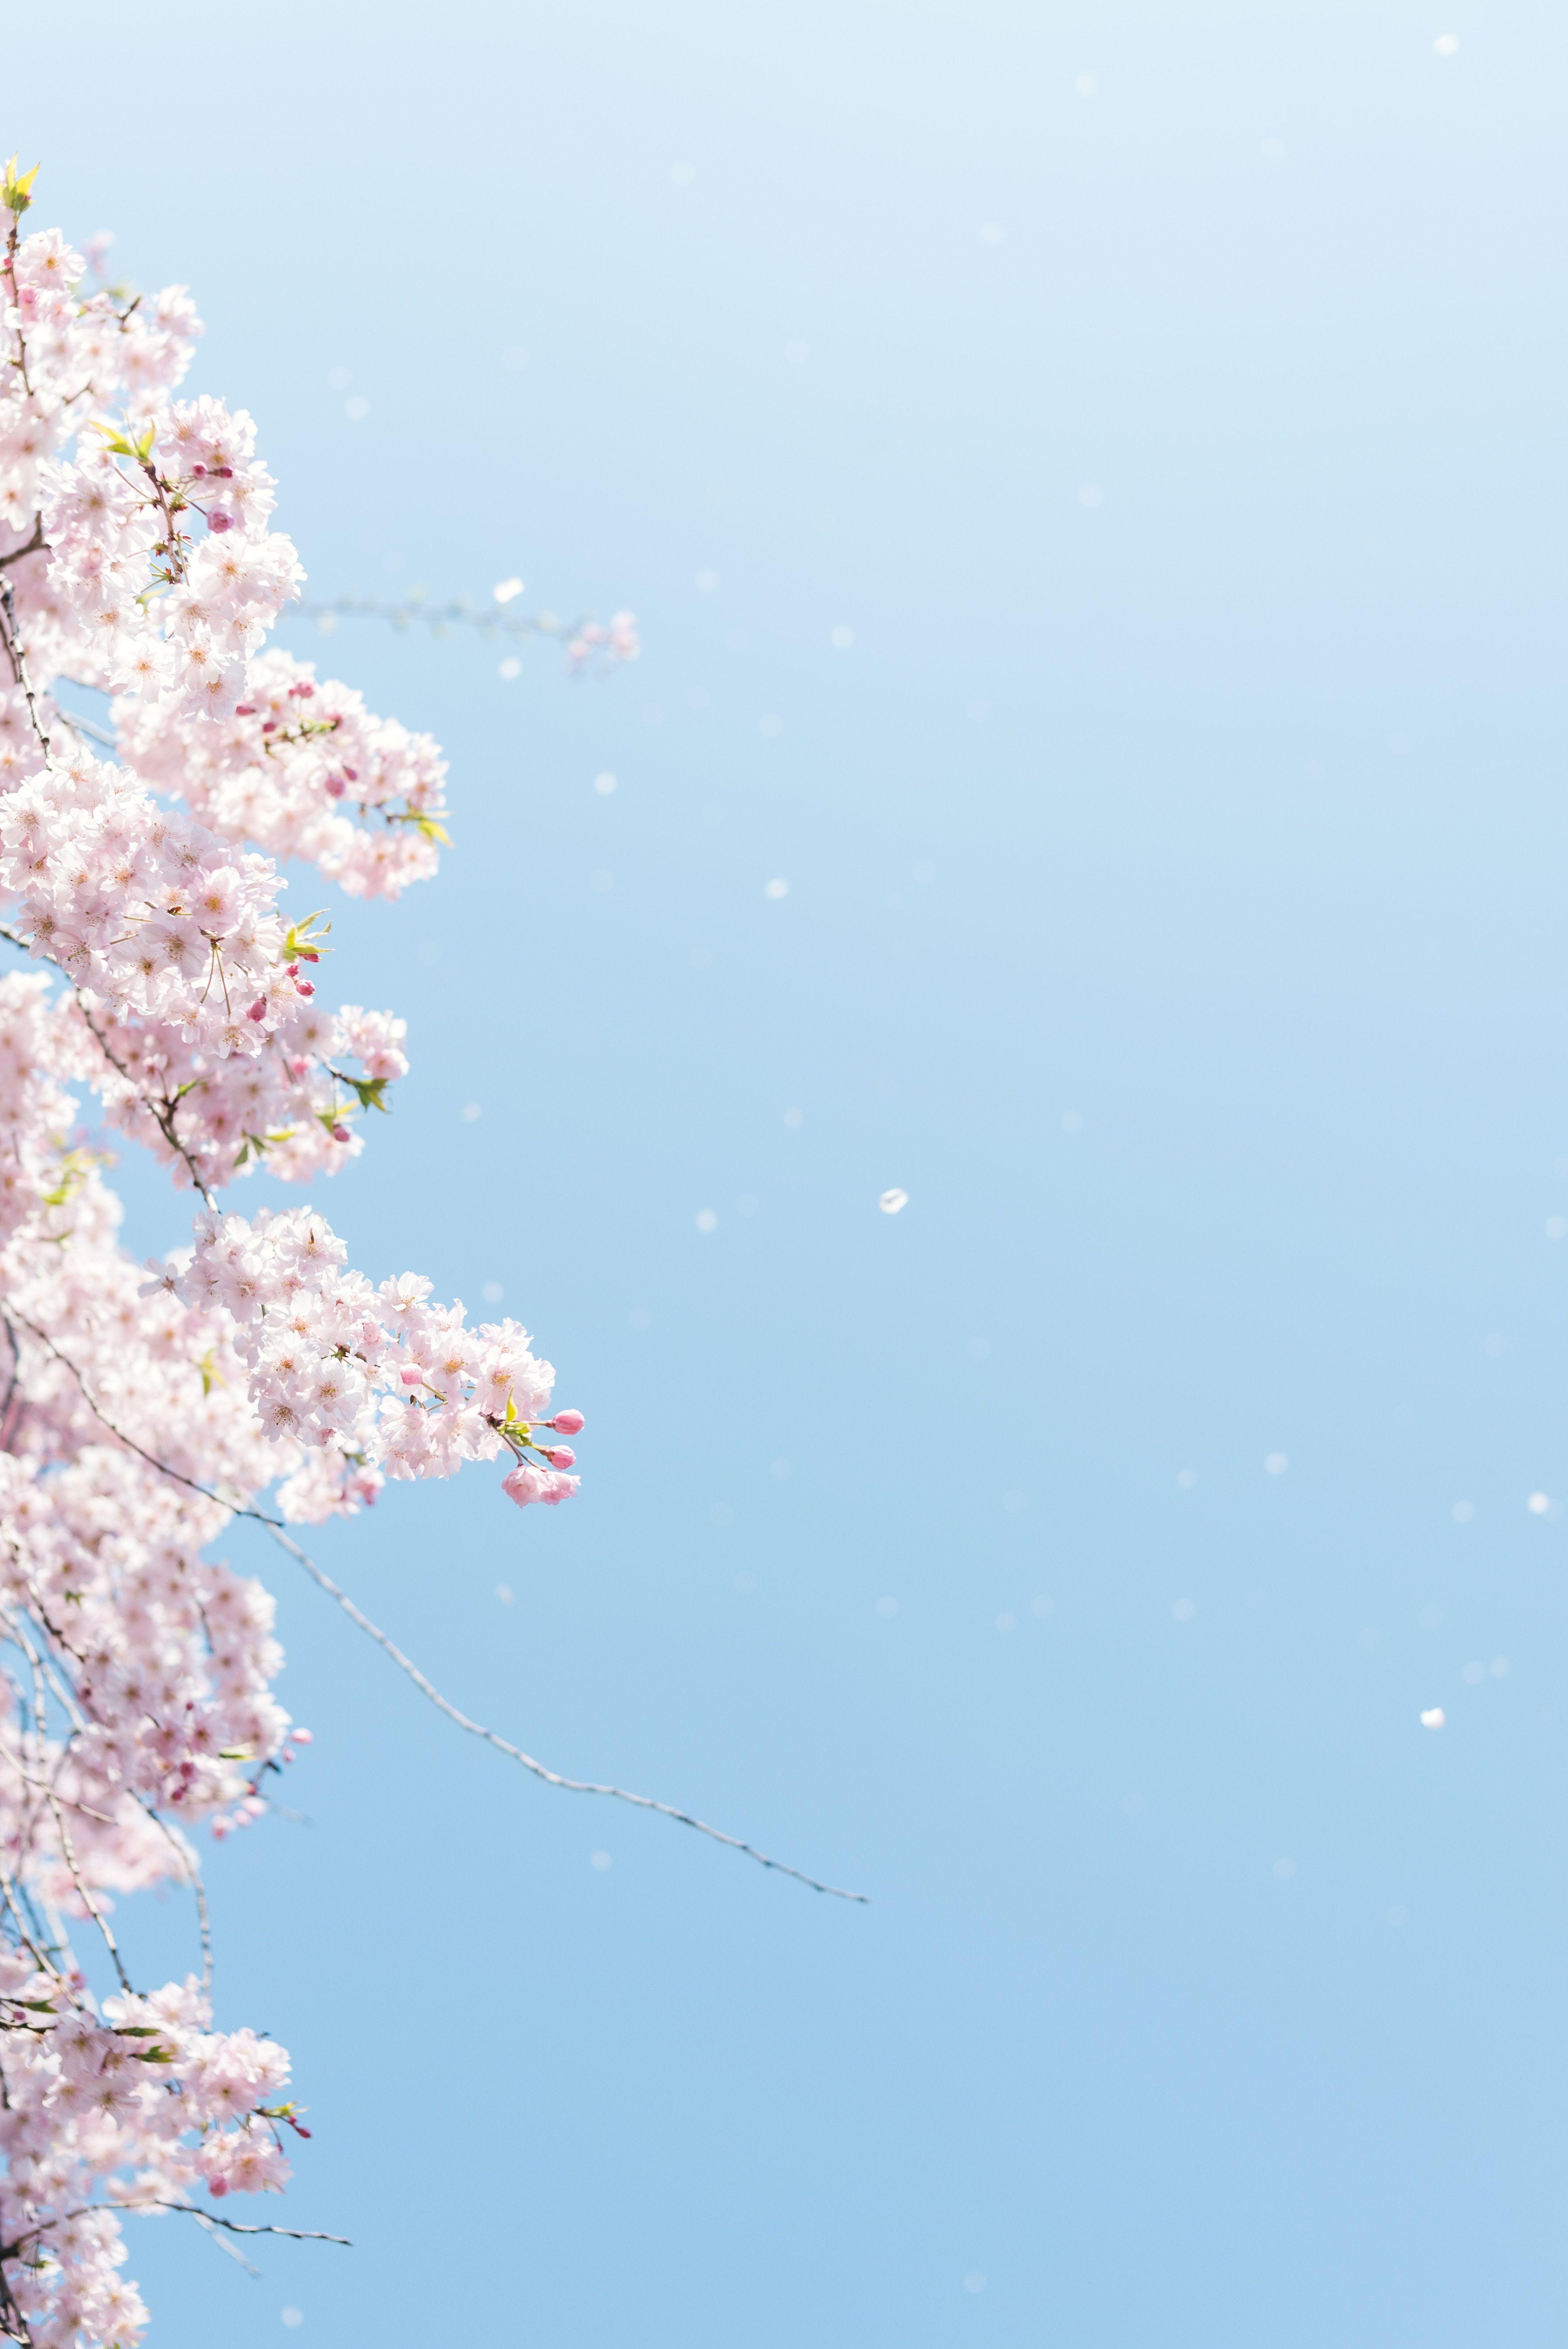 Shinjuku Gyoen National Garden Shinjuku Ku Japan Cherry Blossom Under Blue Sky N Cherry Blossom Wallpaper Cherry Blossom Pictures Cherry Blossom Background